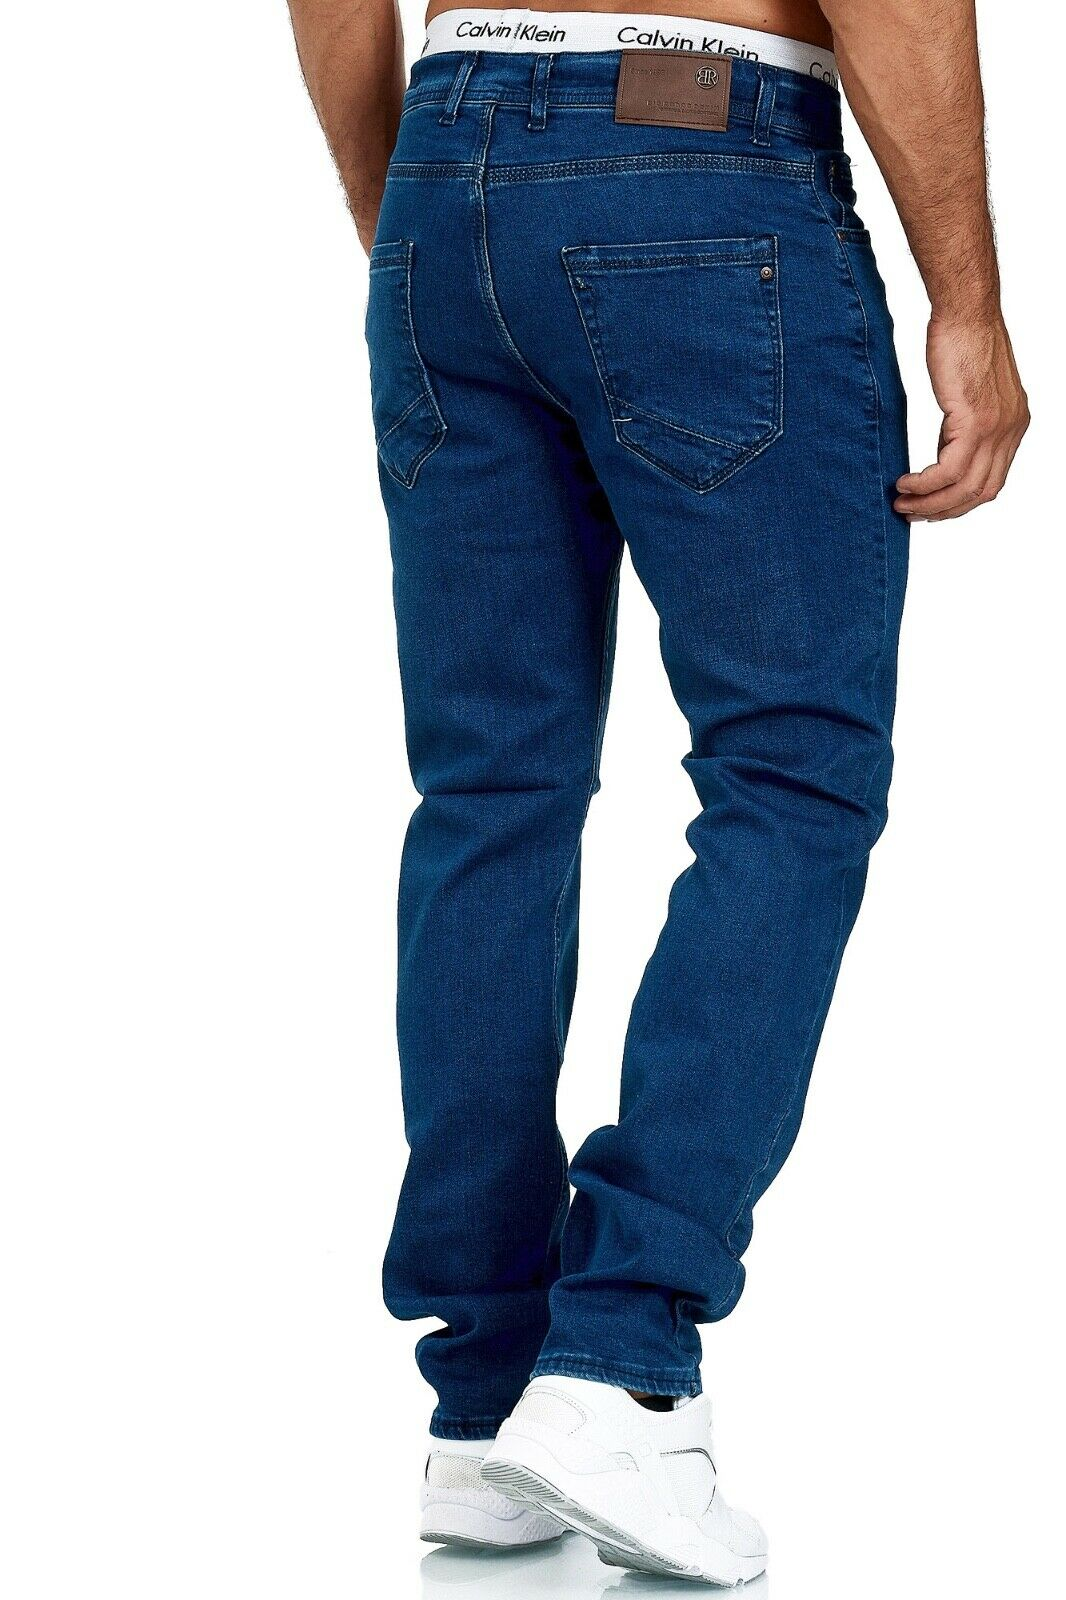 Herren-Jeans-Hose-Denim-KC-Black-Washed-Straight-Cut-Regular-Dicke-Naht-naehte Indexbild 34